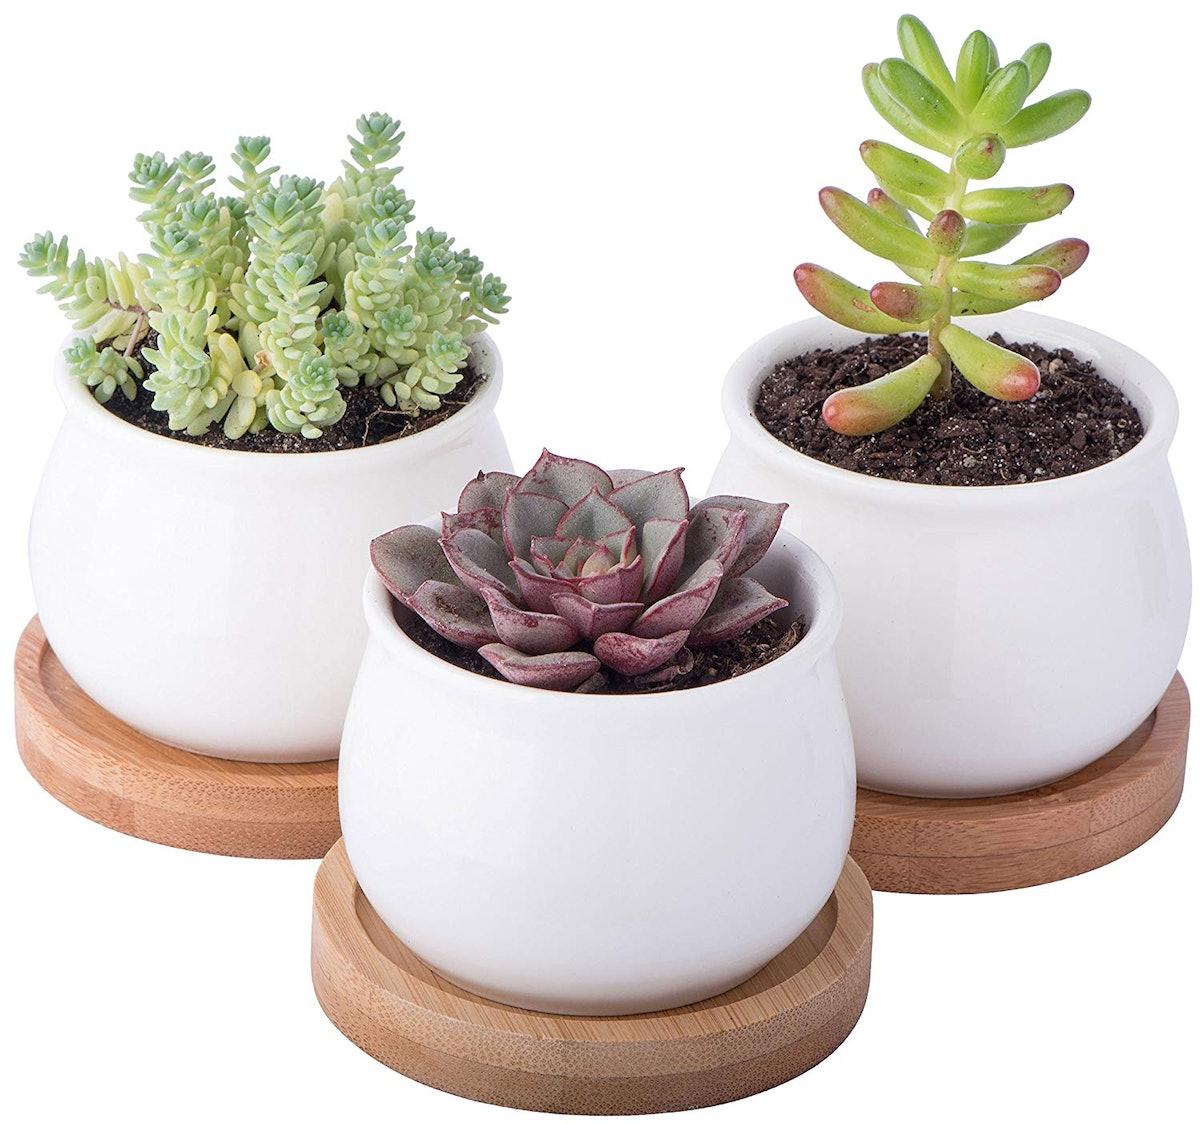 StarPack Premium Succulent Planter Pot Set (Set of 3)